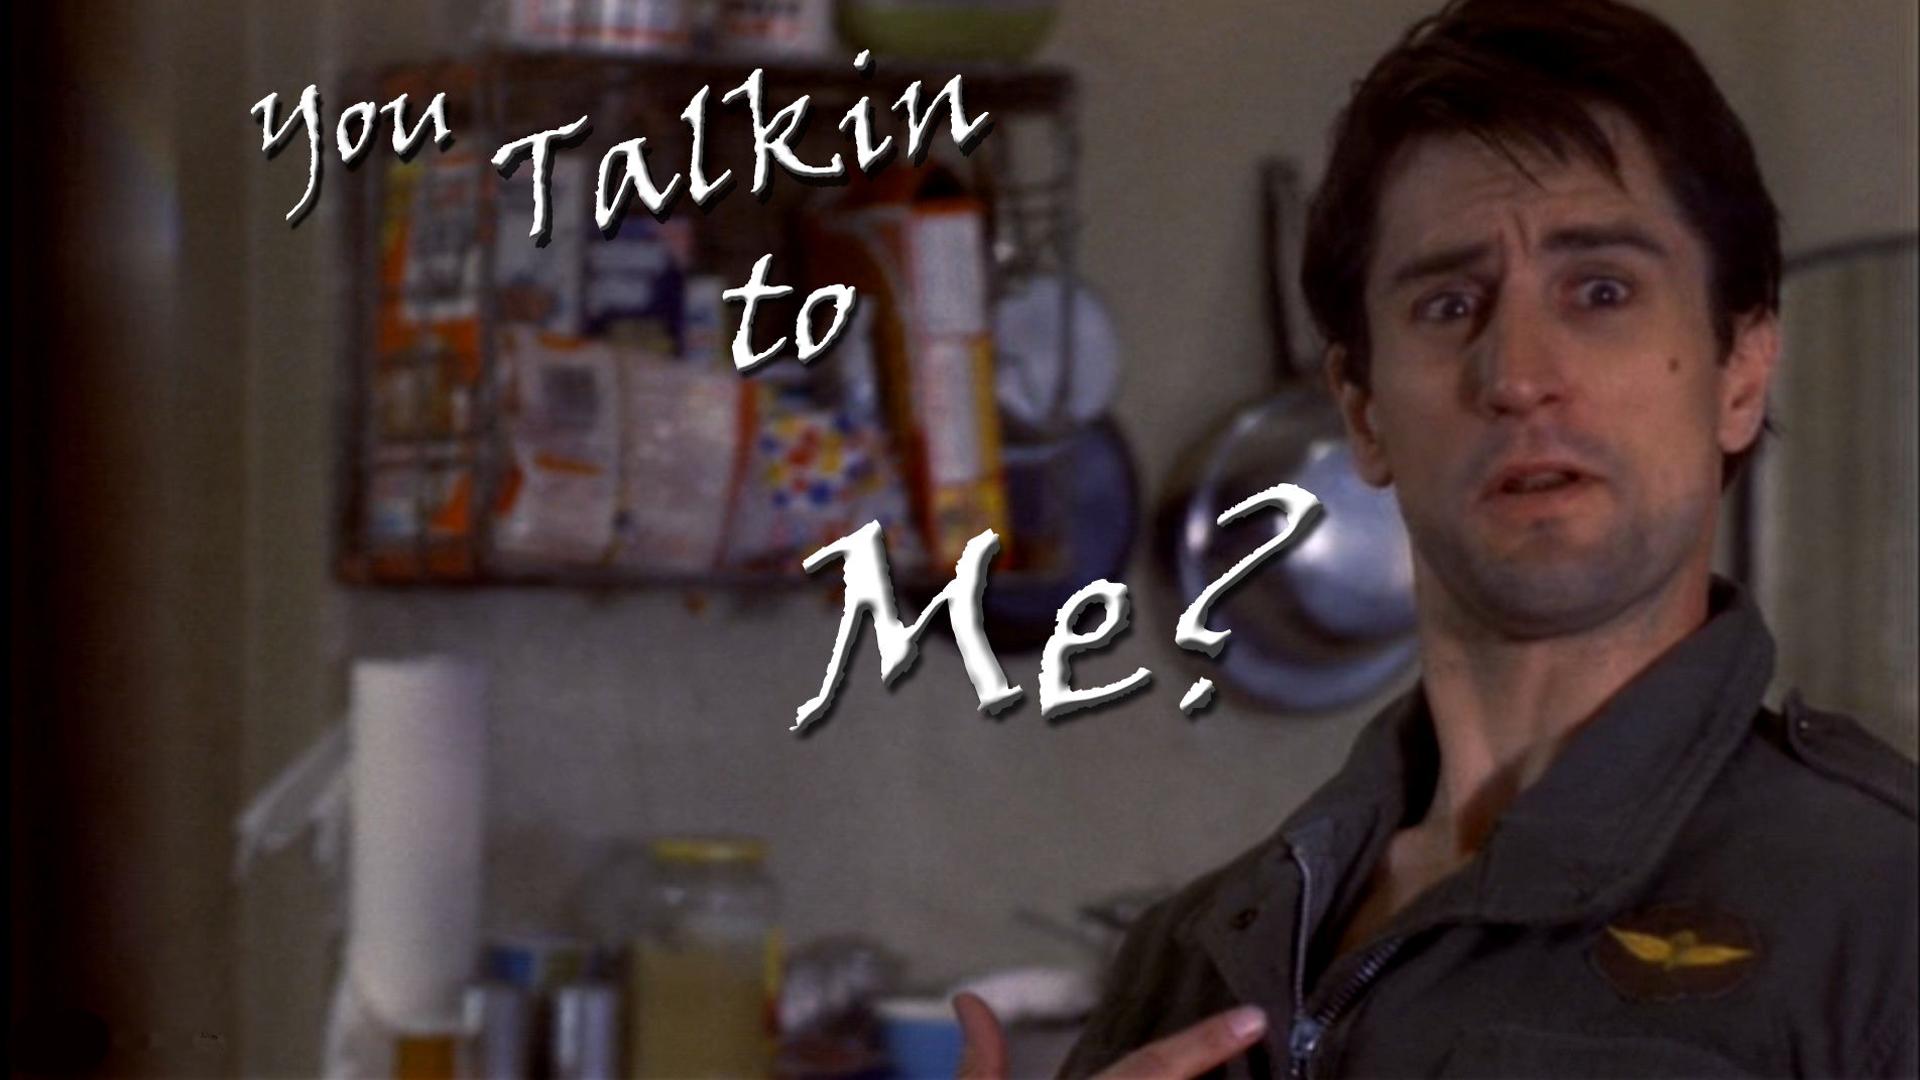 You Talkin To Me